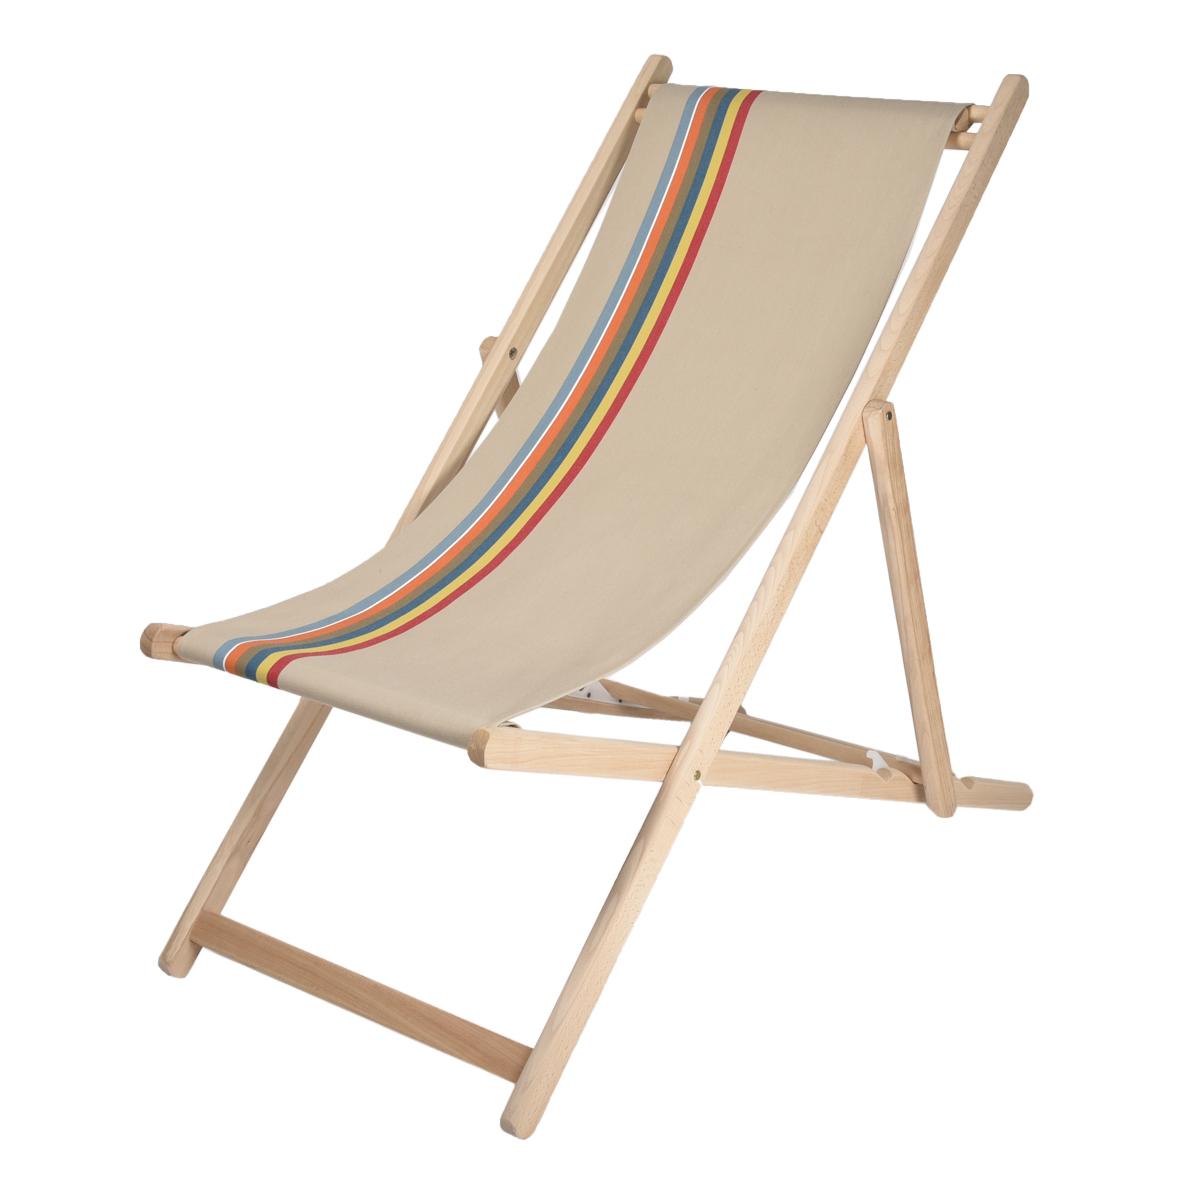 Toile transat pr te poser pour chilienne chaise for Chaise longue toile